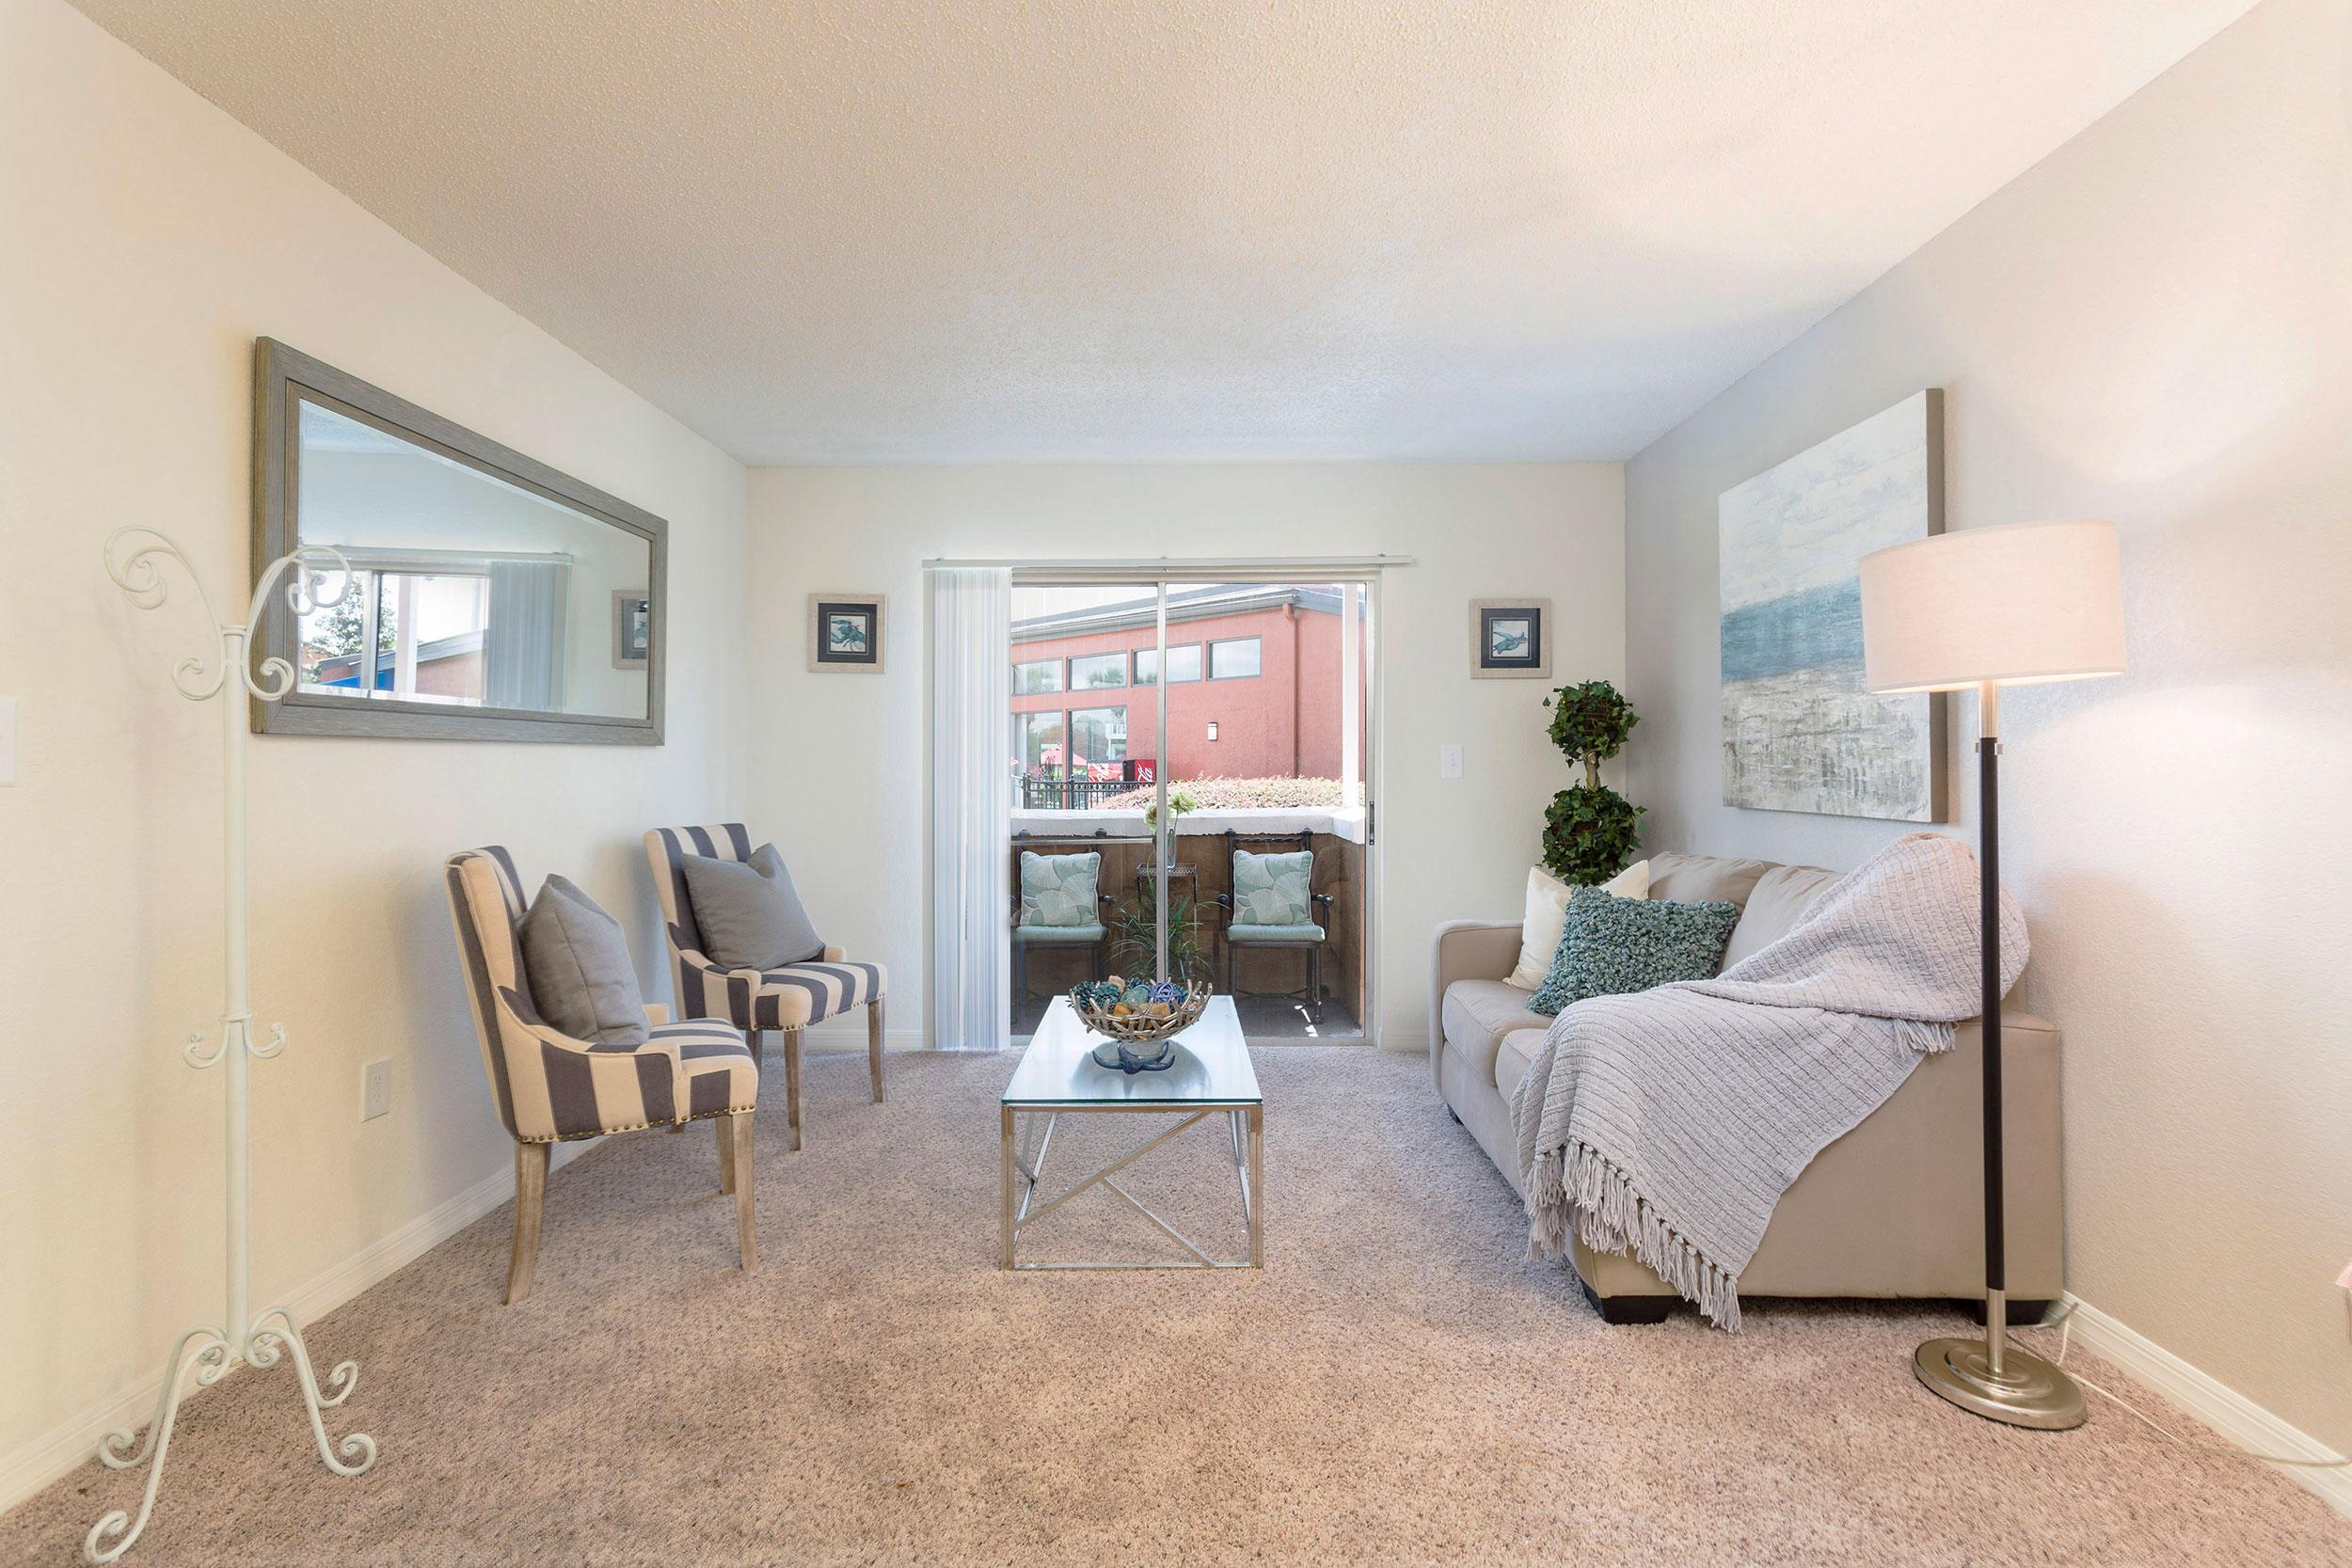 Hb-living-room